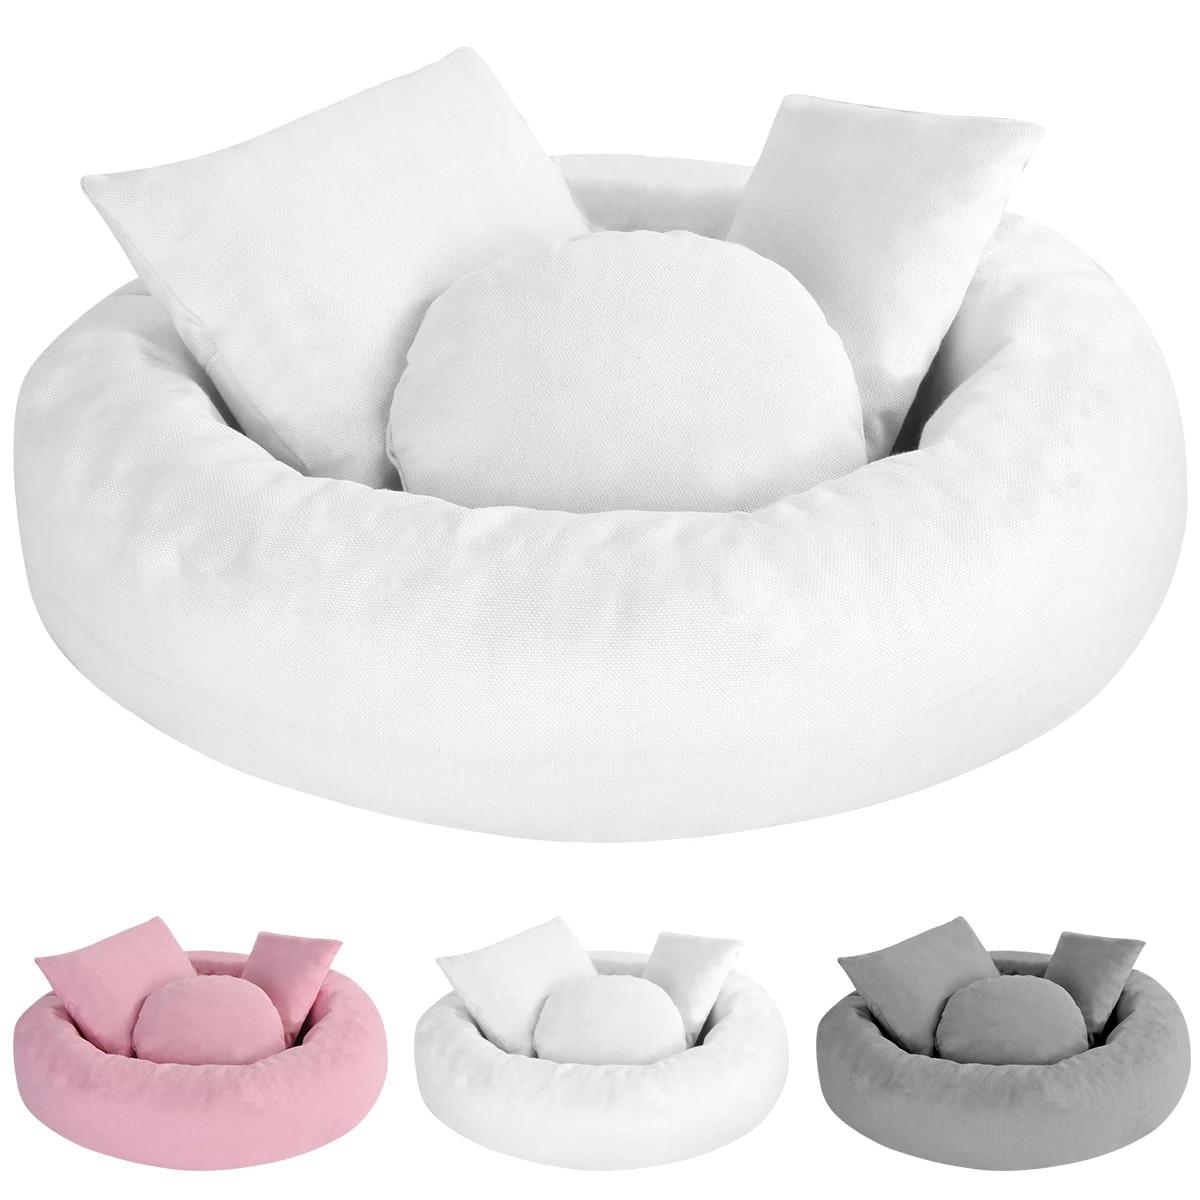 Baby Photo Shoot Wheat Donut Posing Props 4 Pcs Set Baby Pillows Ring Newborn Photography Props Basket Filler Fotografia Pillow Aliexpress